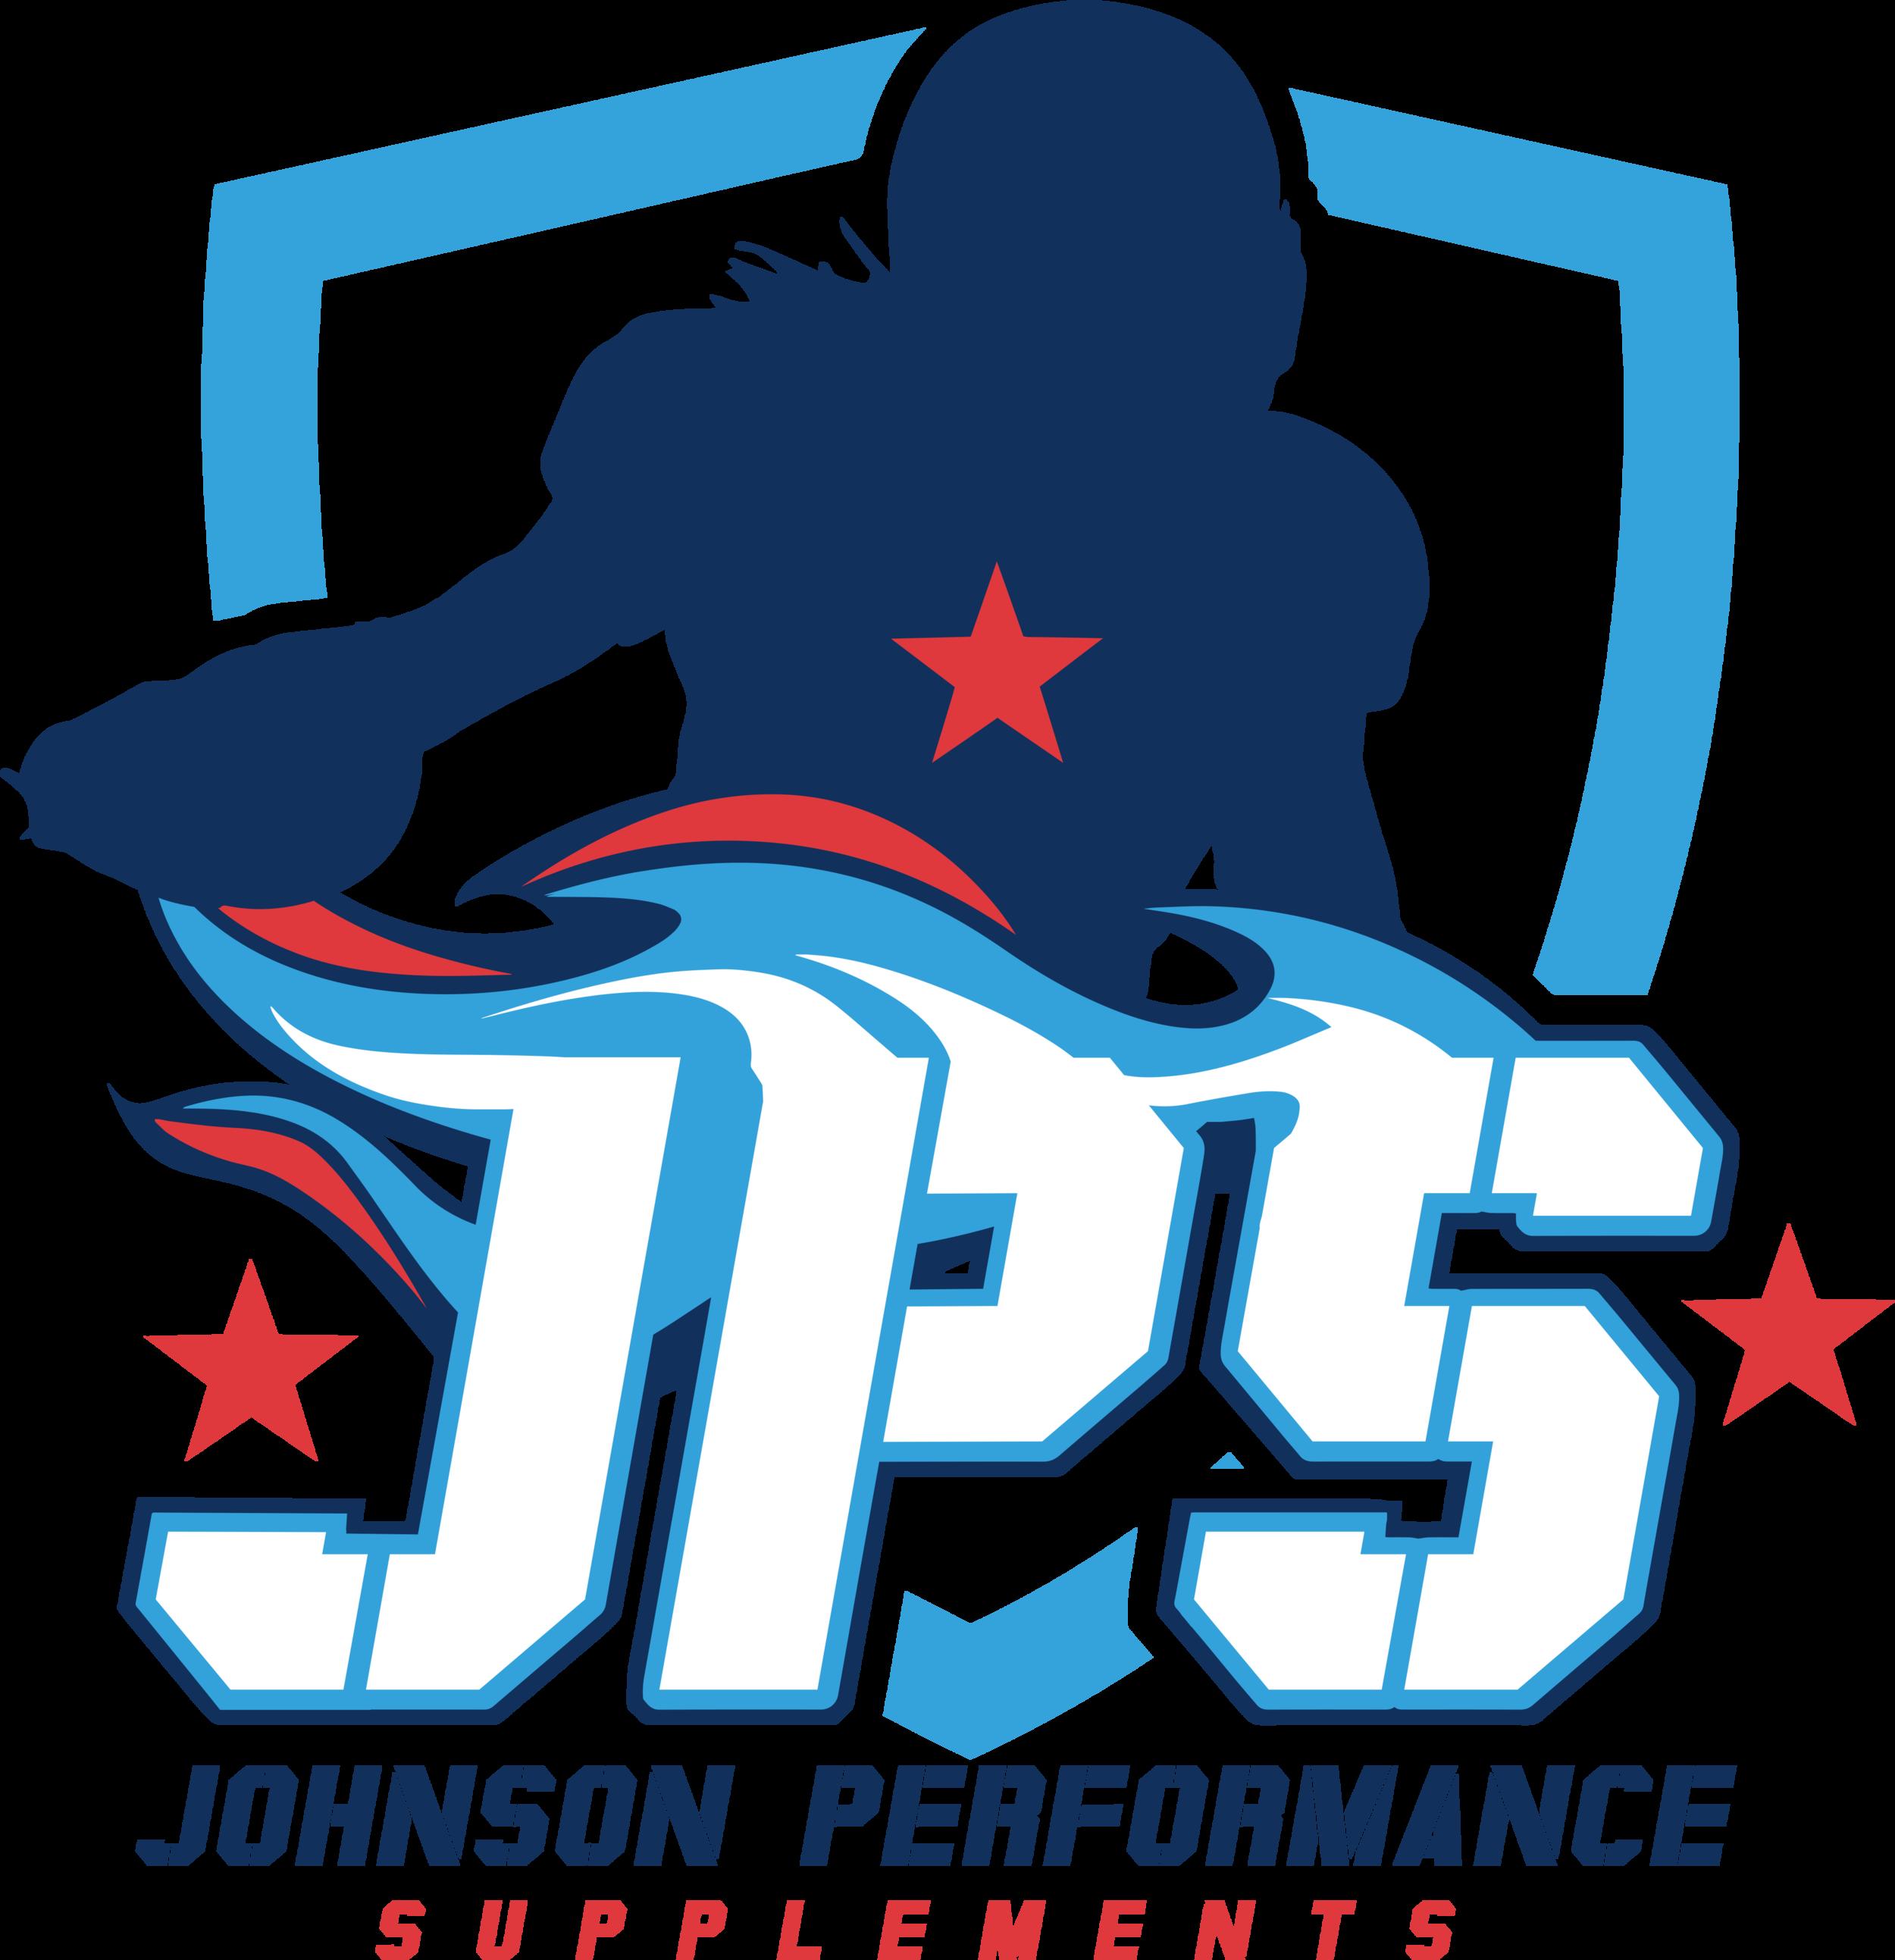 Chris Johnson Vector logo.png